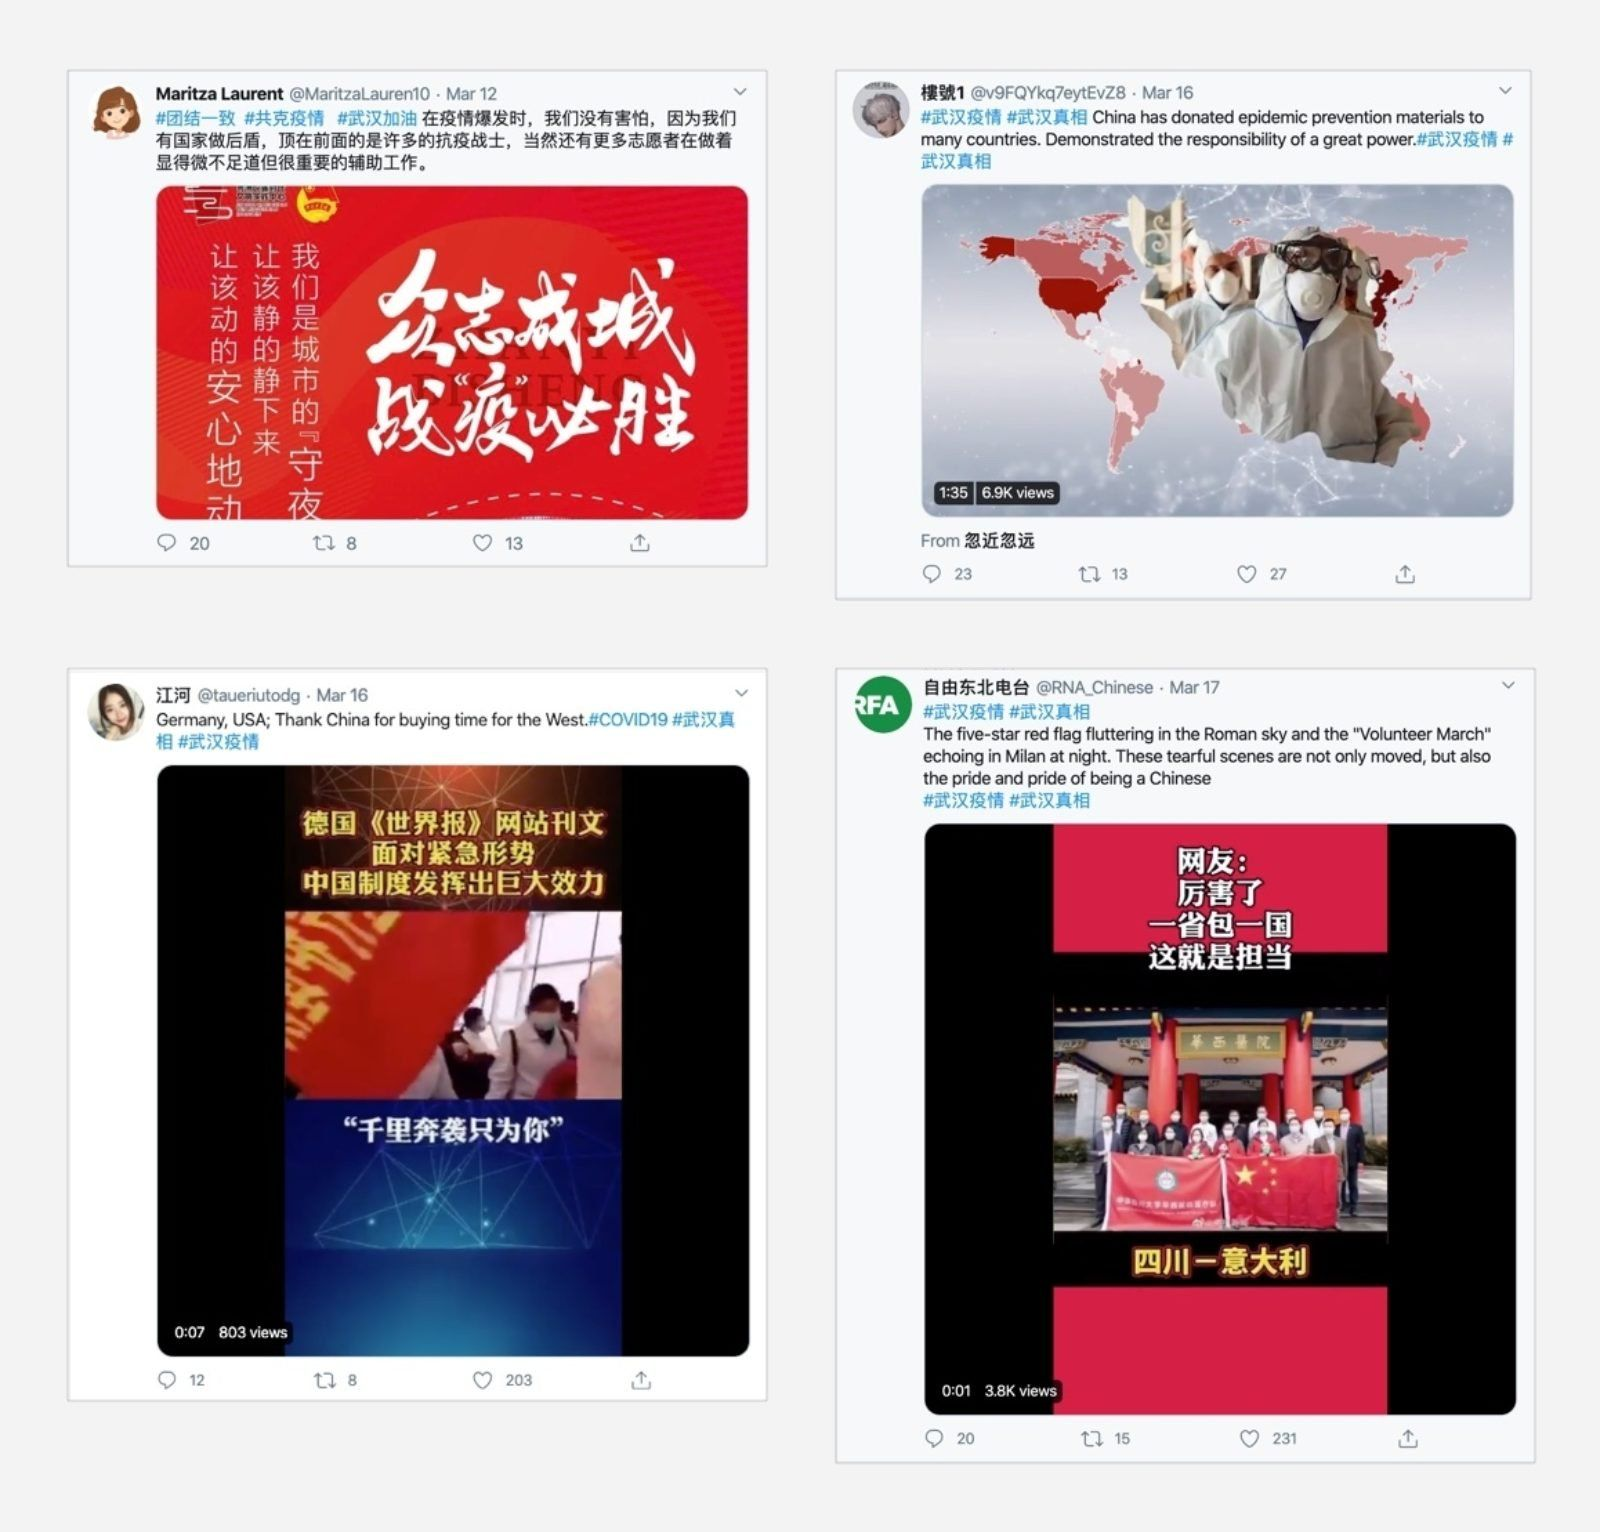 La propagande en Chine pendant le Covid-19.